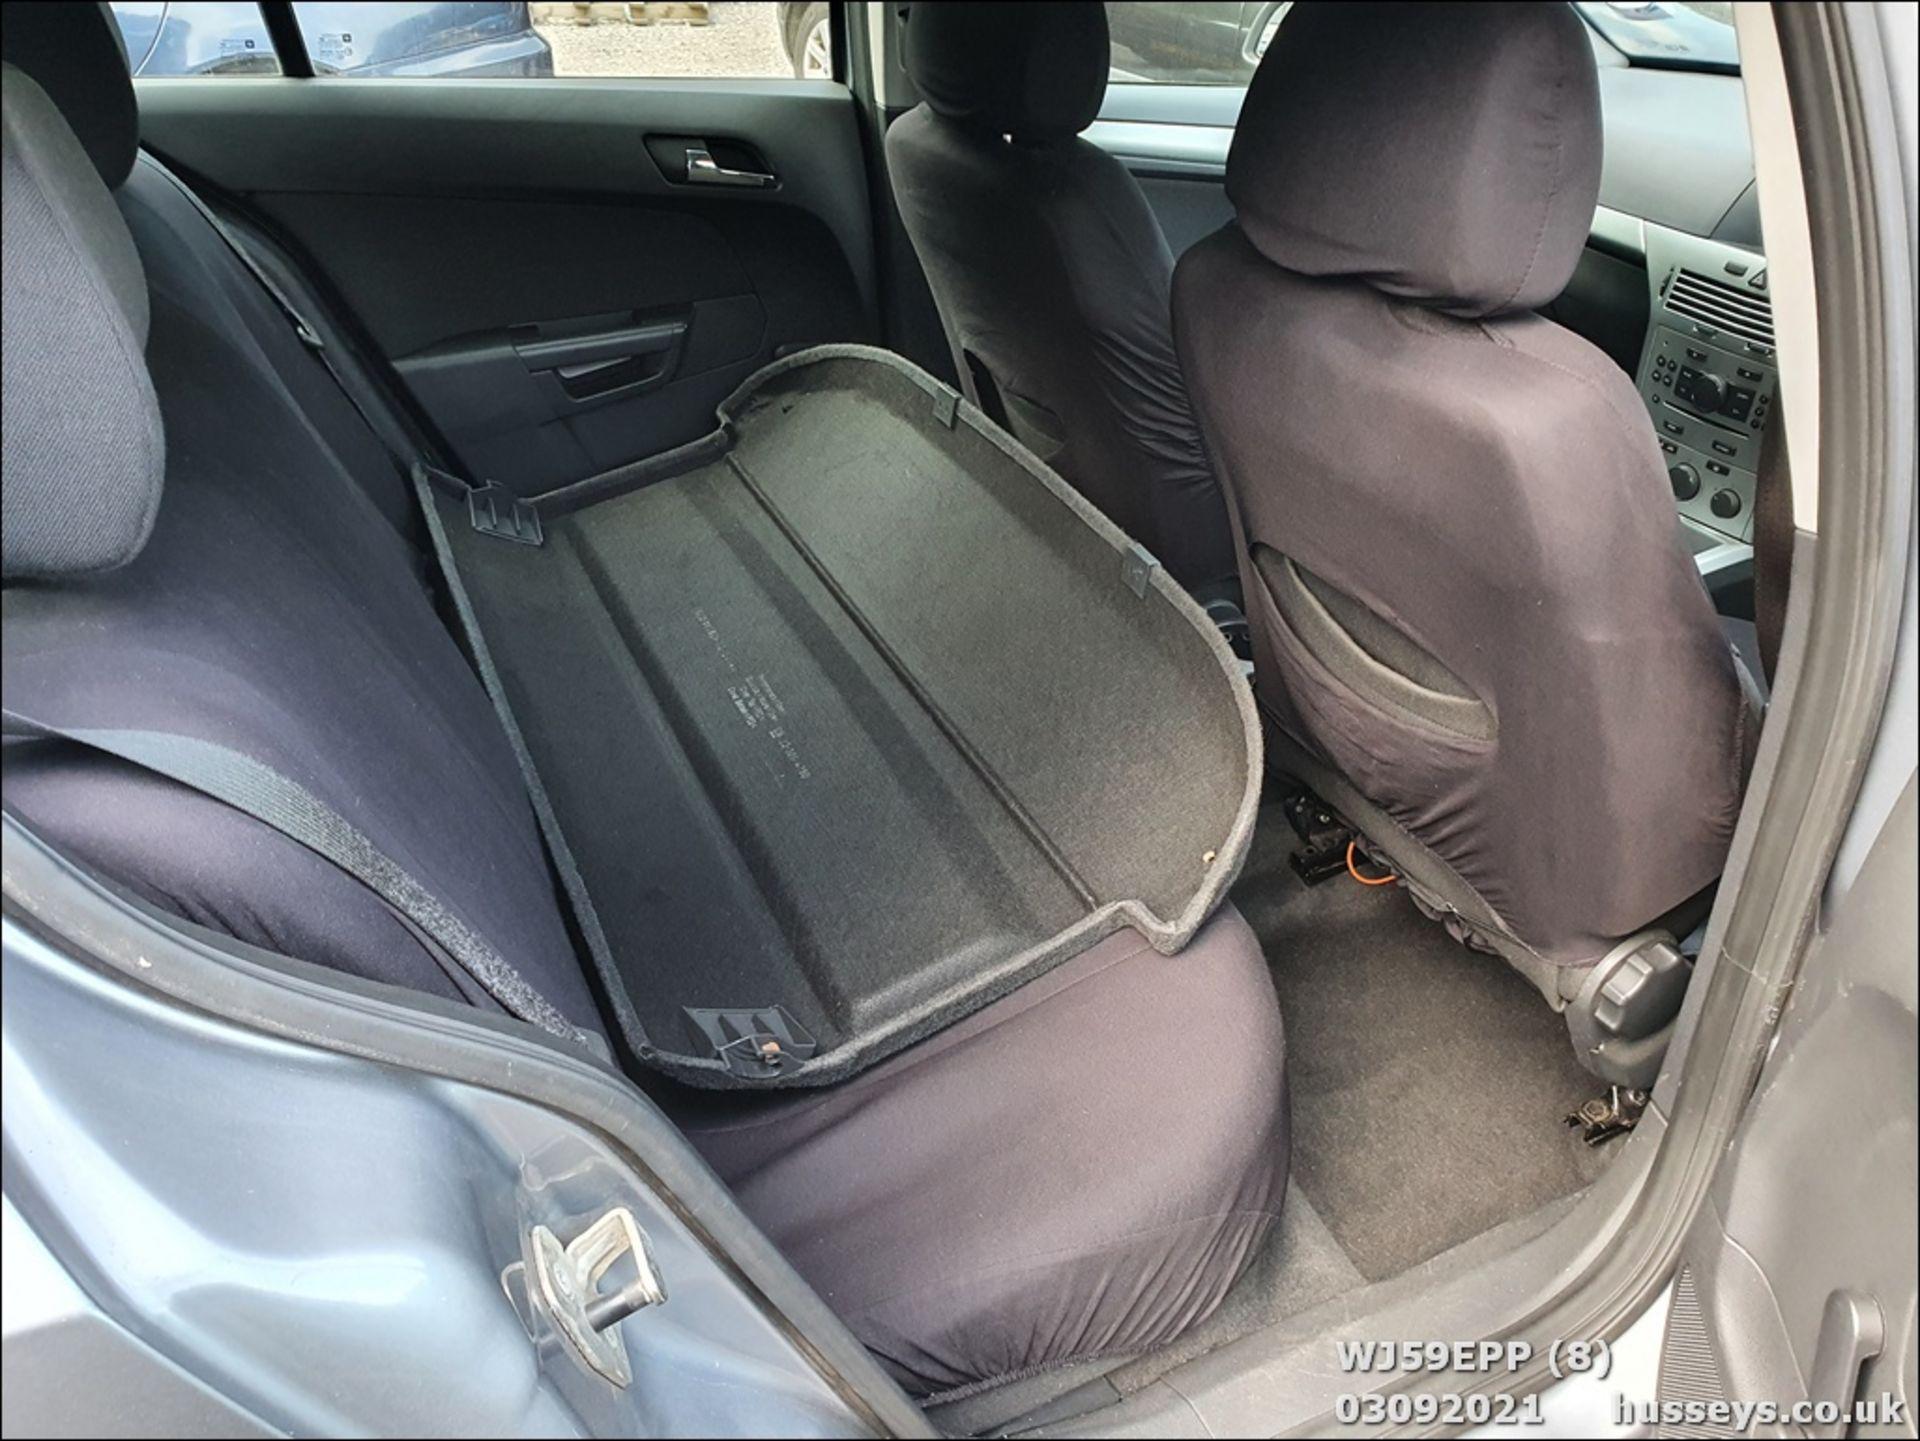 09/59 VAUXHALL ASTRA ACTIVE - 1364cc 5dr Hatchback (Silver, 101k) - Image 8 of 12